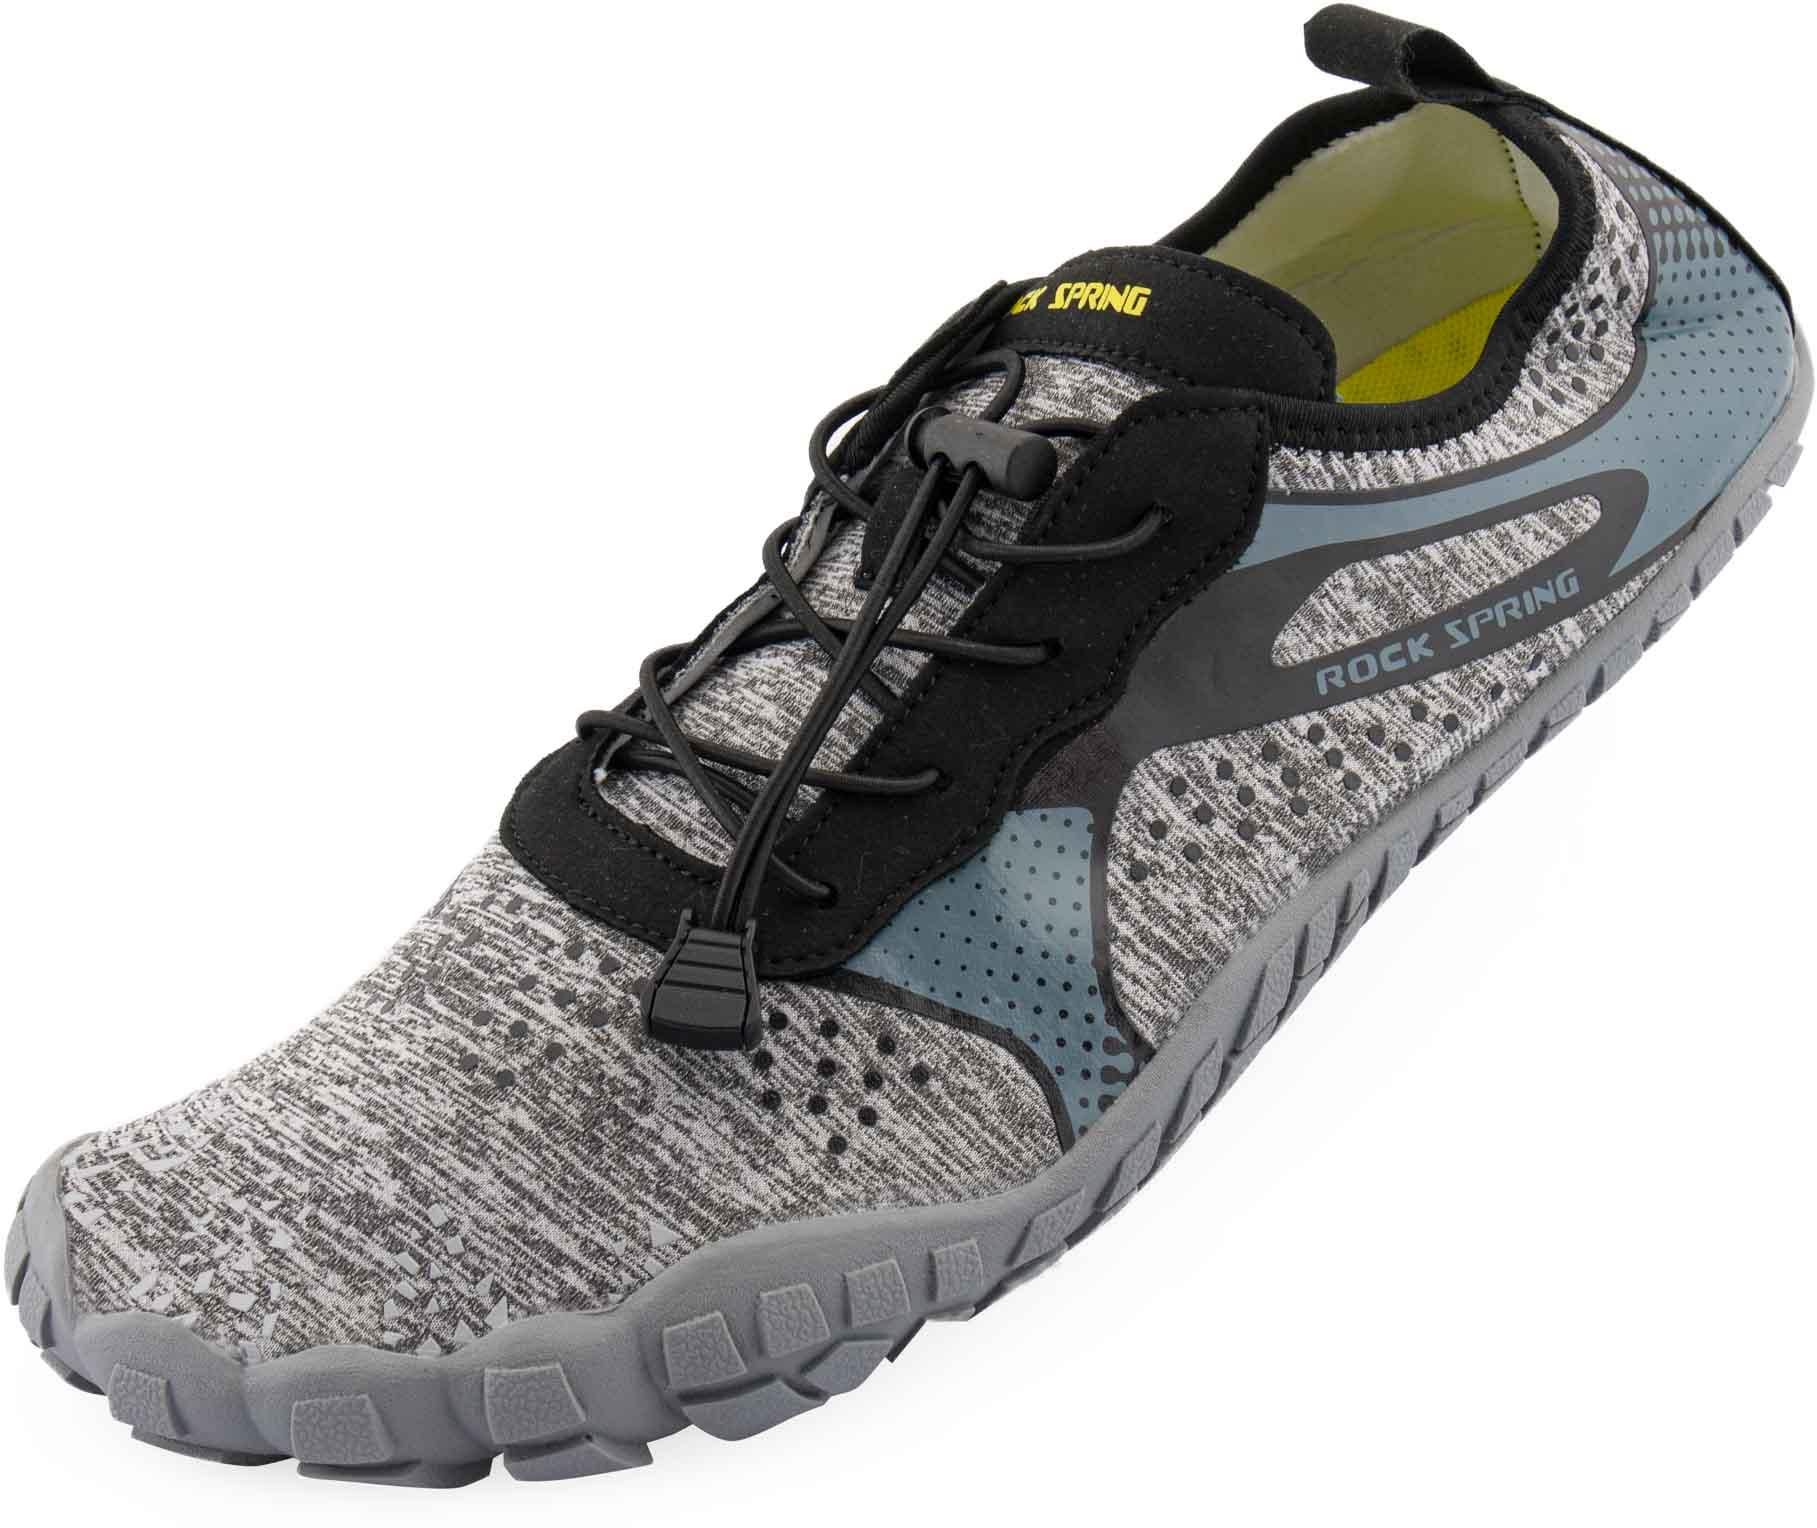 Pánská obuv Rock Spring Atila Gray